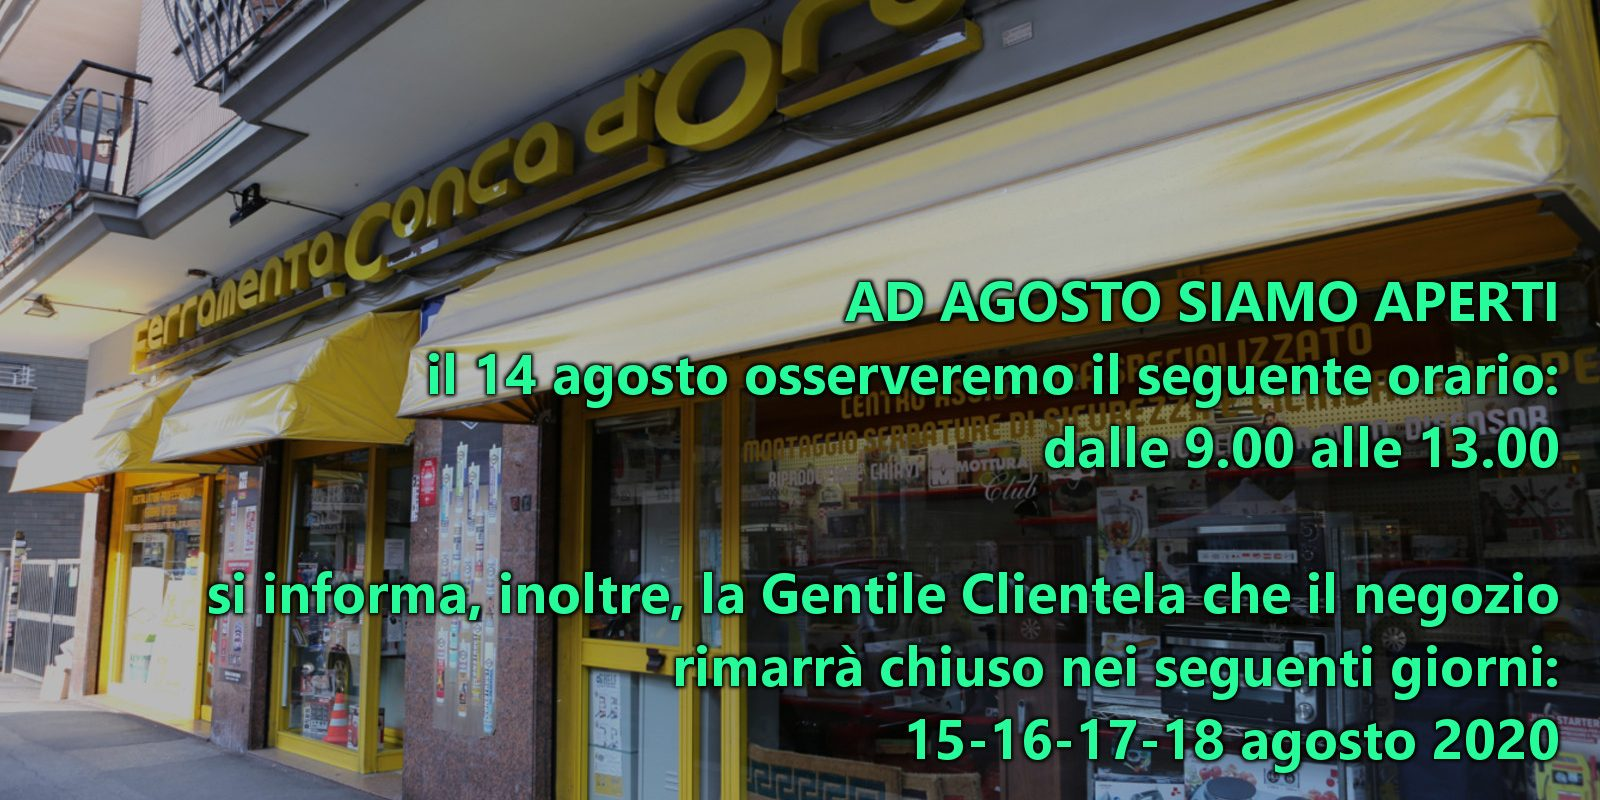 slide-Ferramenta-Conca-d'Oro-chiusura-estiva-2020